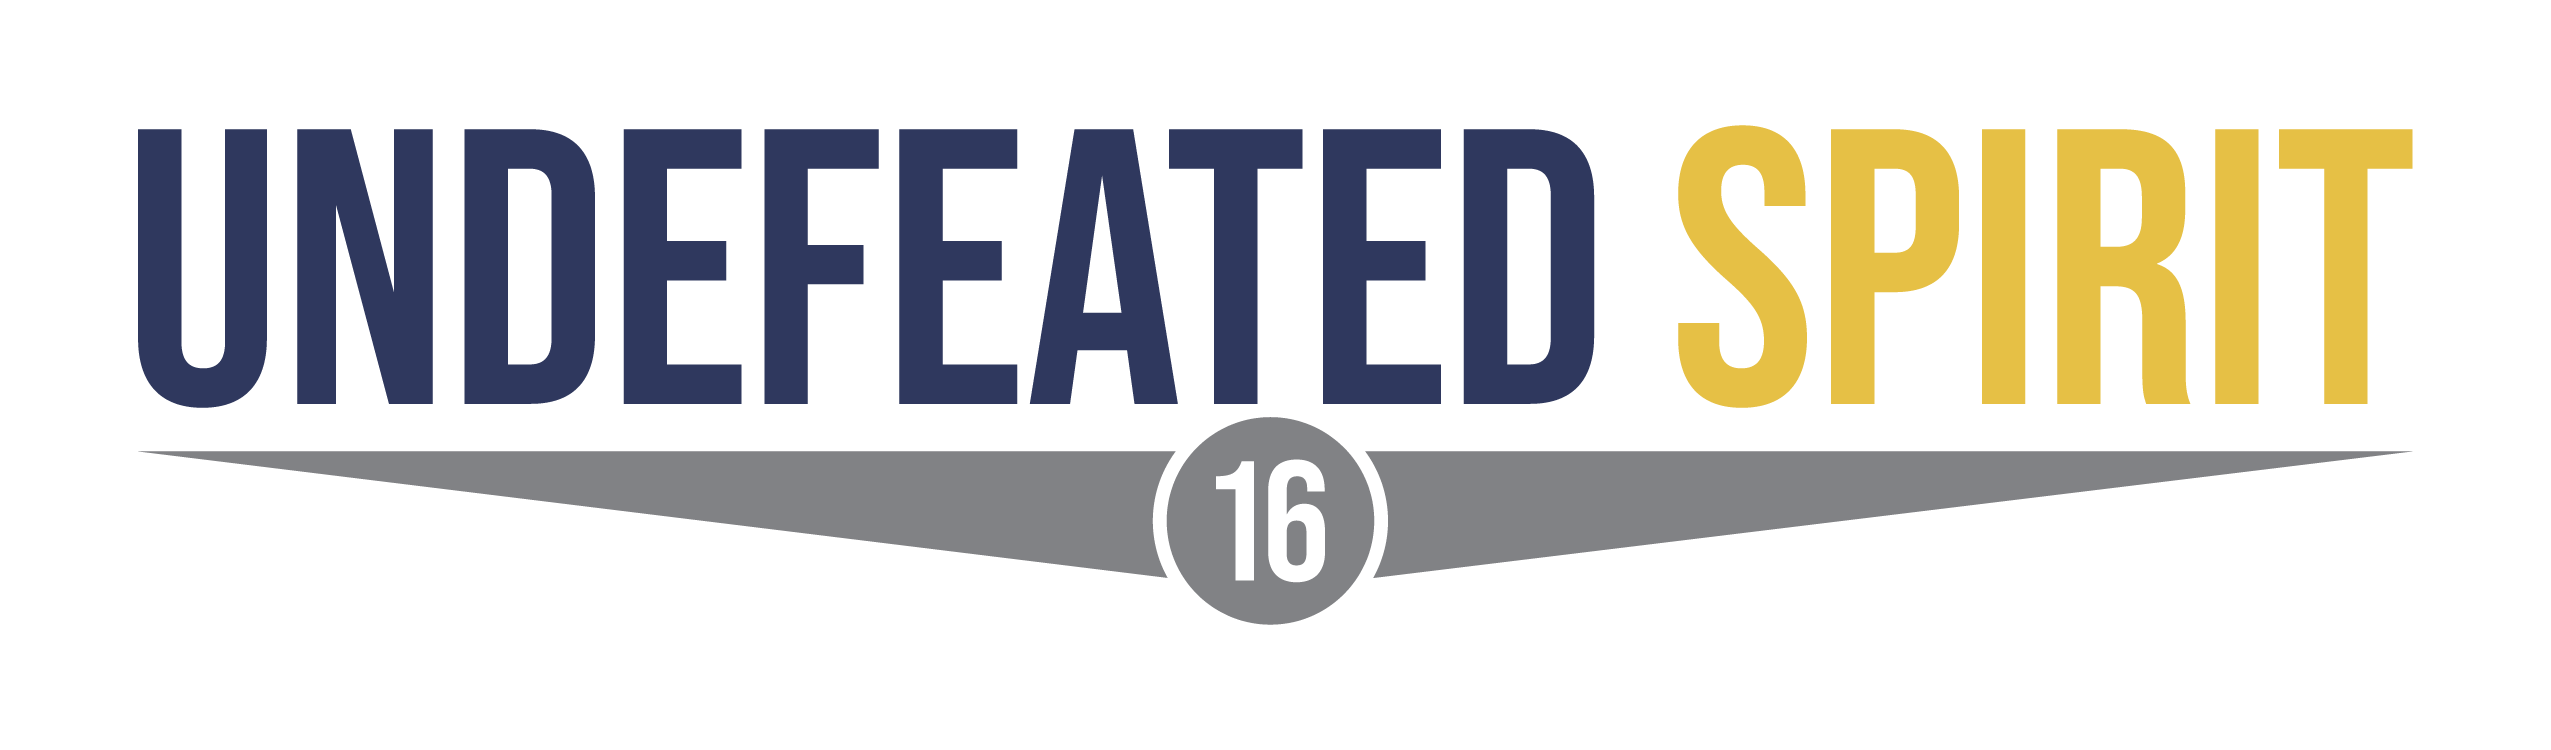 Undefeated Spirit Logo